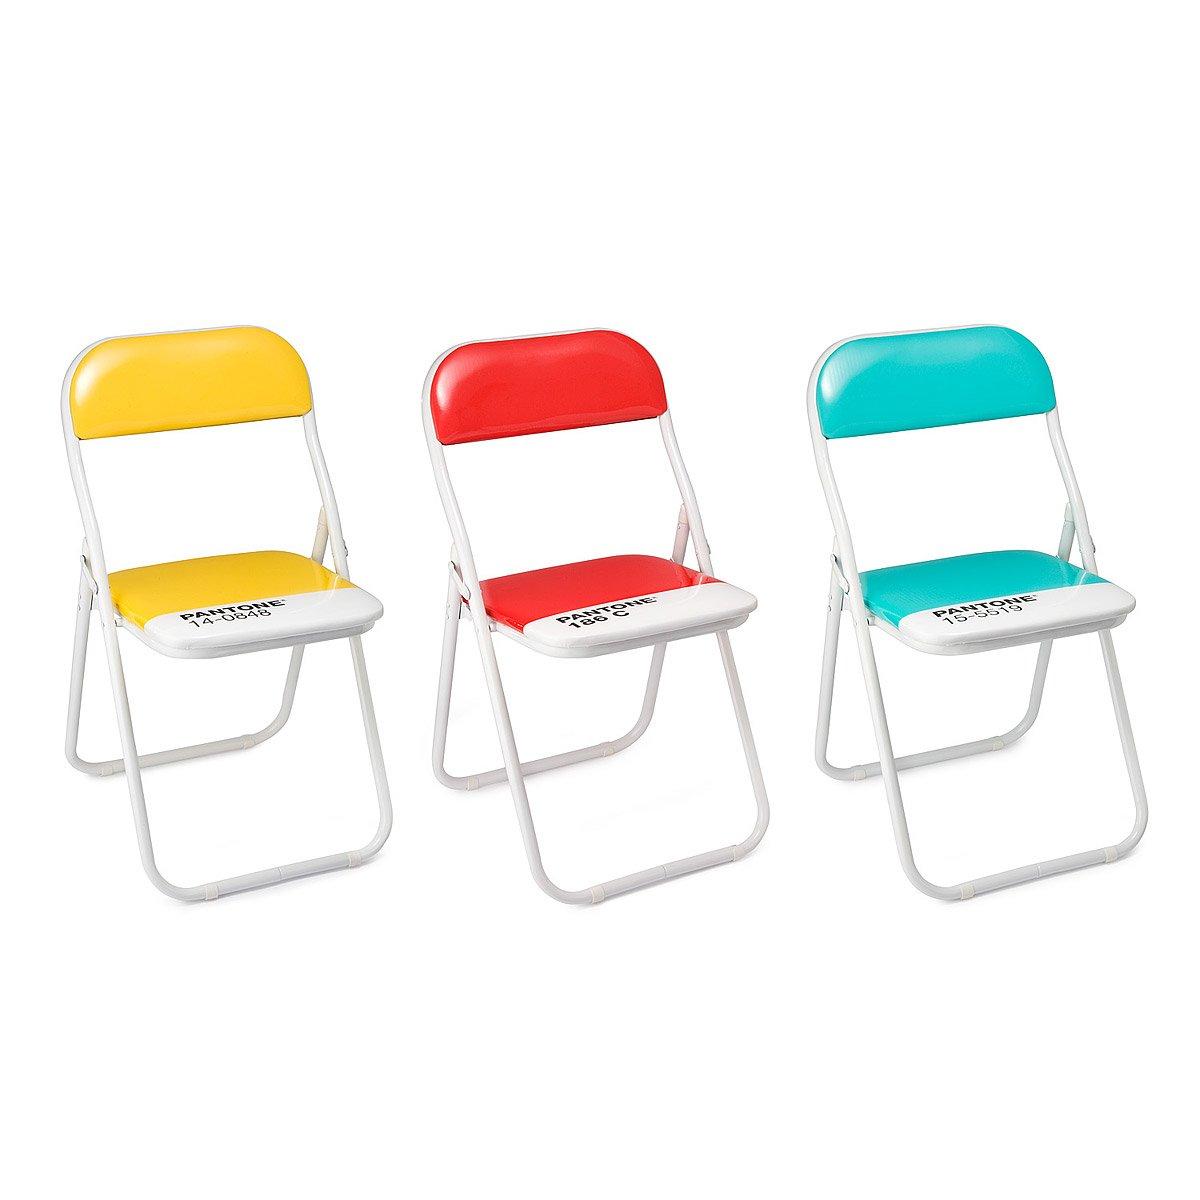 pantone folding chairs 1 thumbnail - Walmart Fold Up Chairs